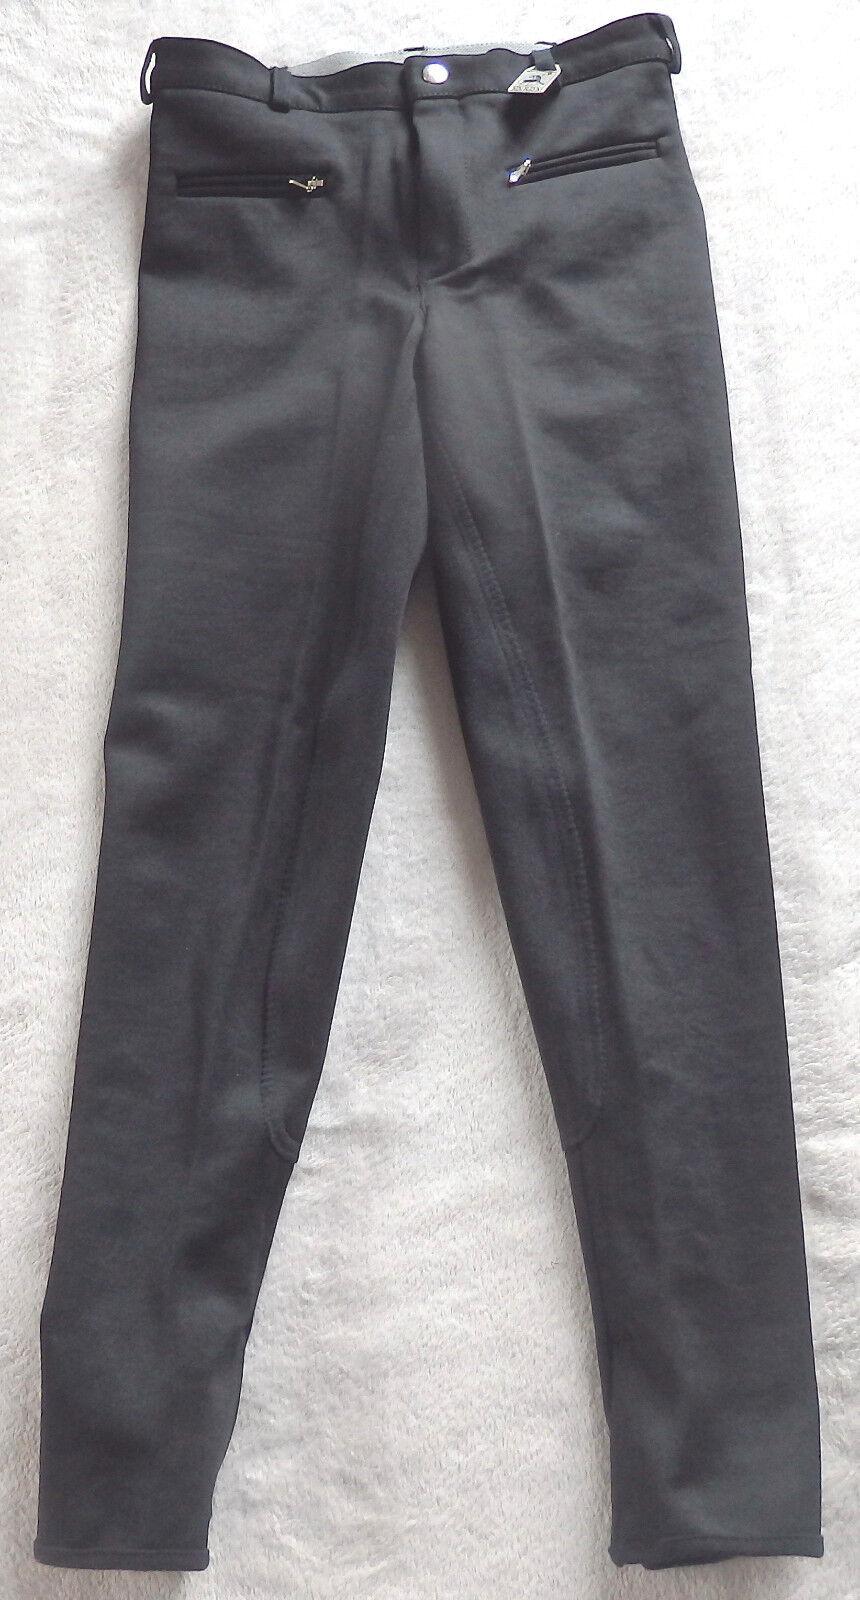 Kyron Softshell reithose, 3 3 3 4 ribete de pleno, negro, talla 42, Alexa invierno, (d99) 217bda